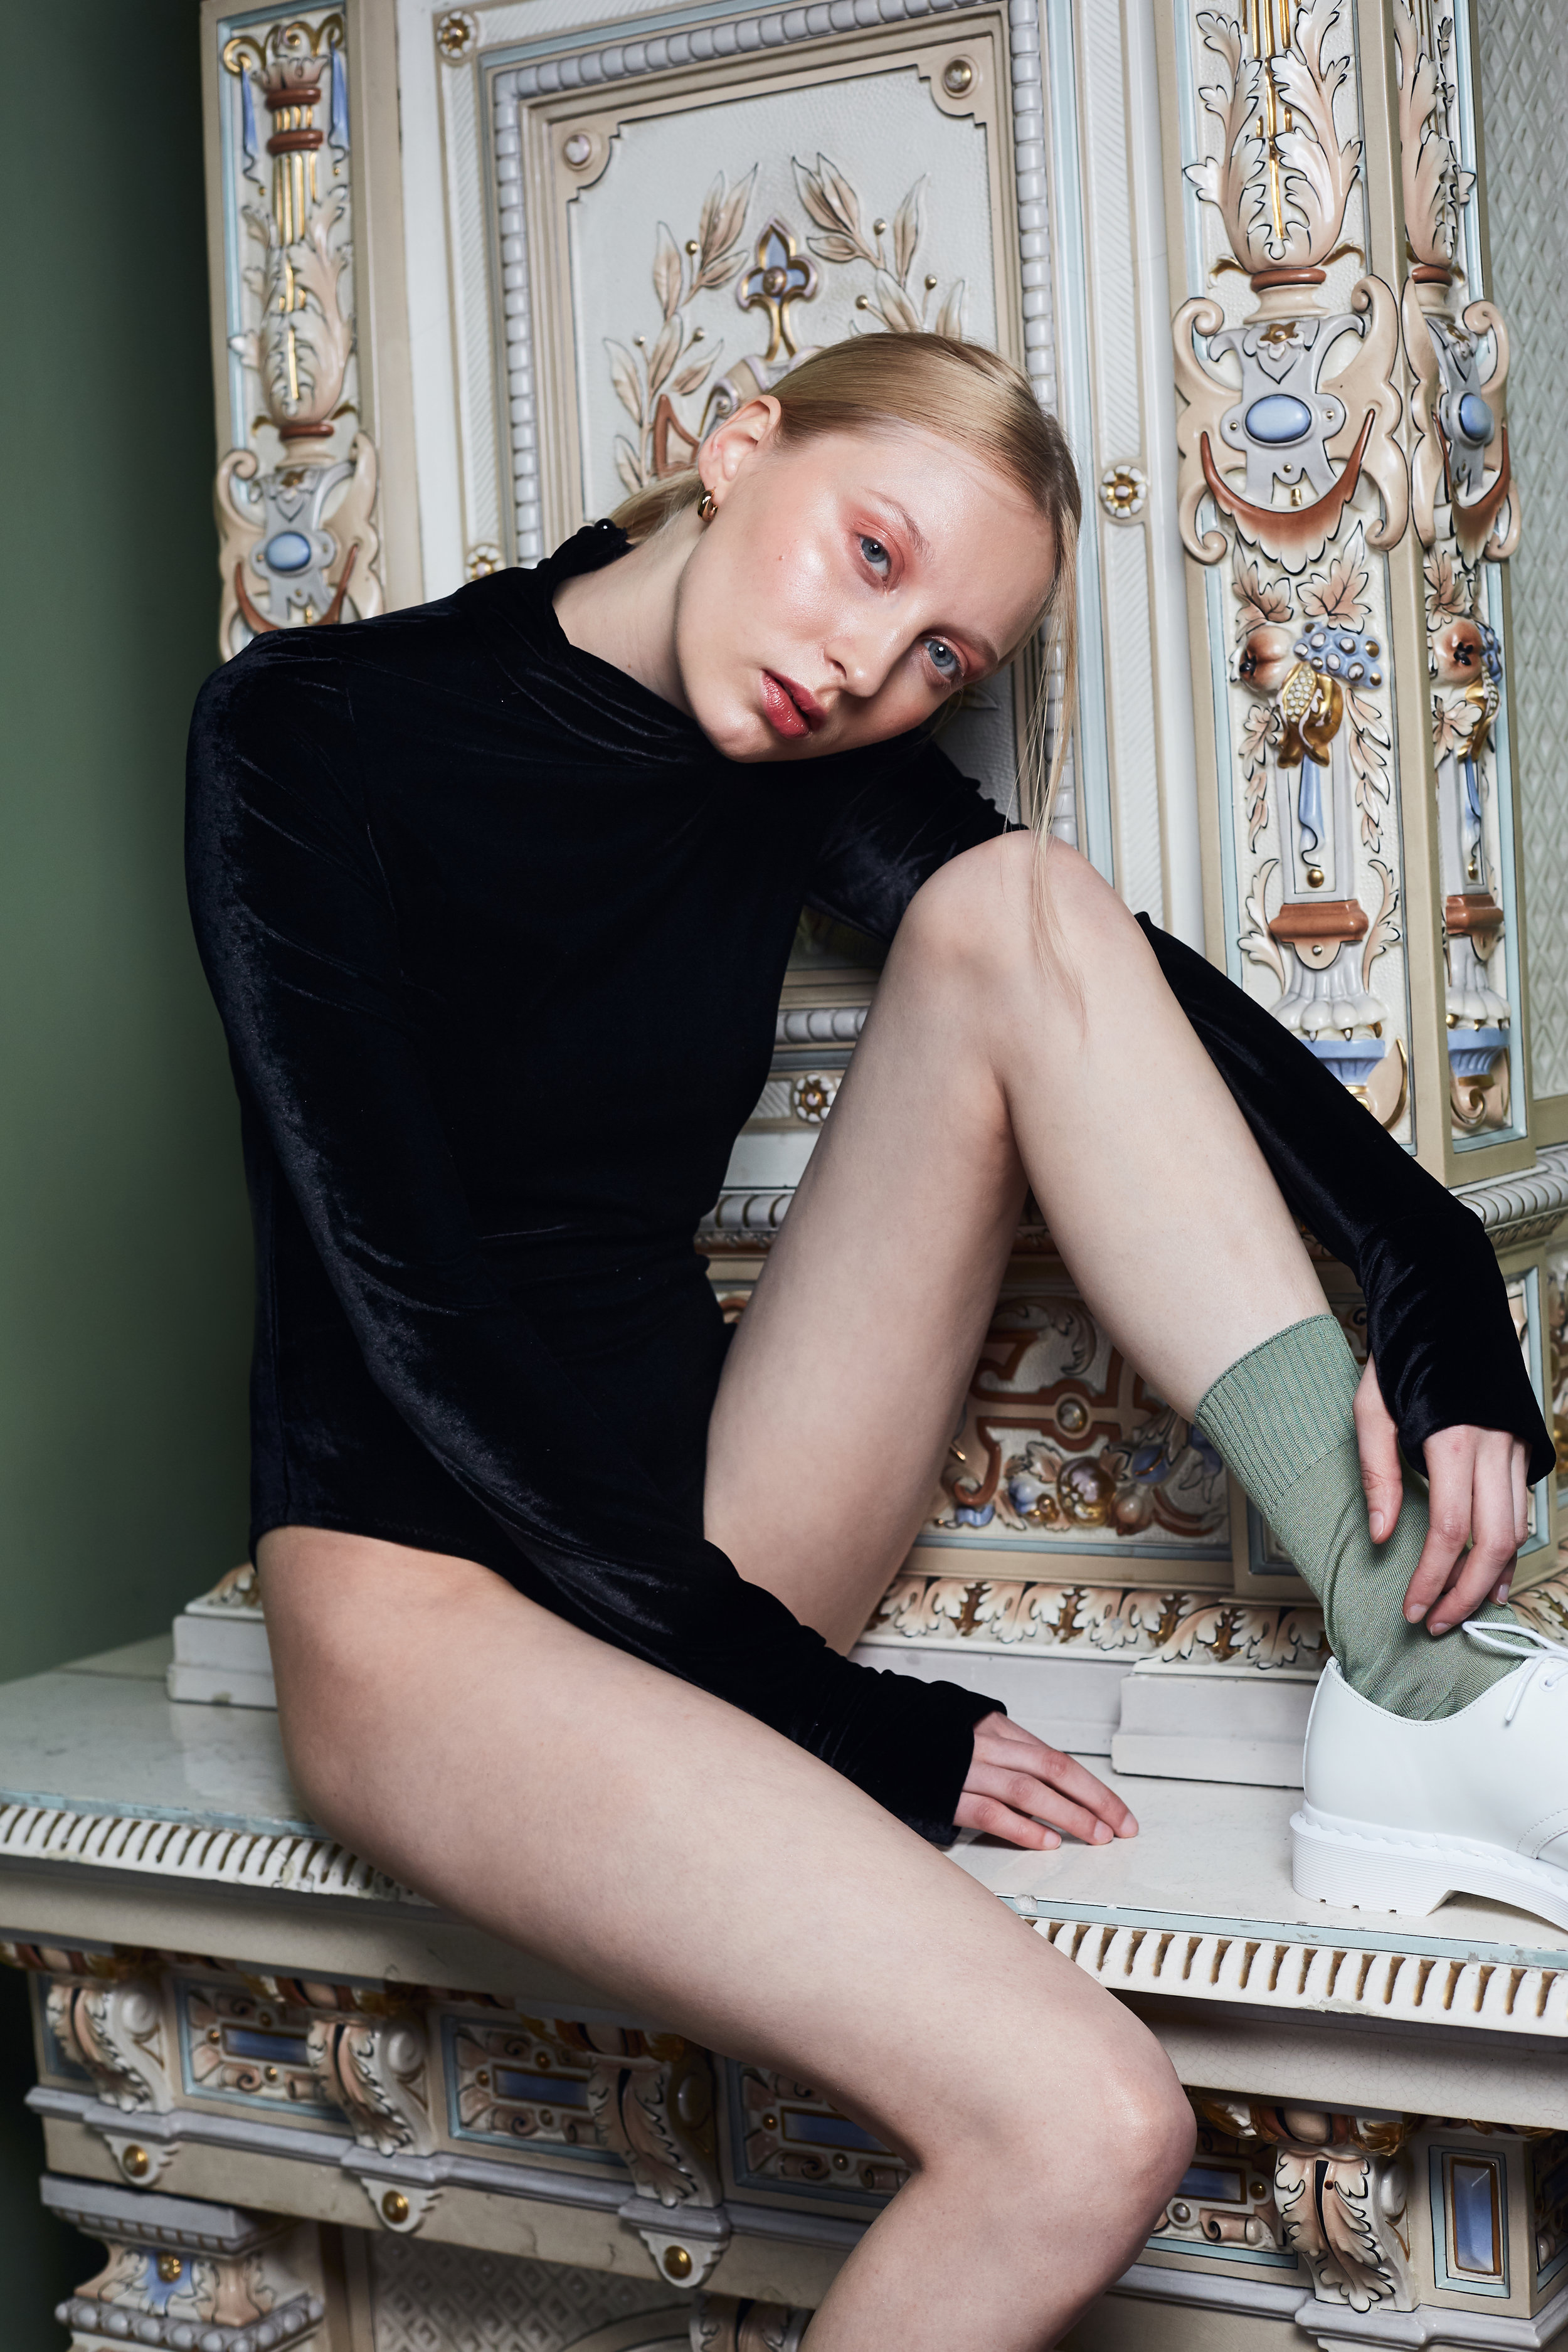 Photography: Atte Tanner / Model: Iris Haapanen / Styling: Vivian Lindholm / MUA: Carmen Rosar